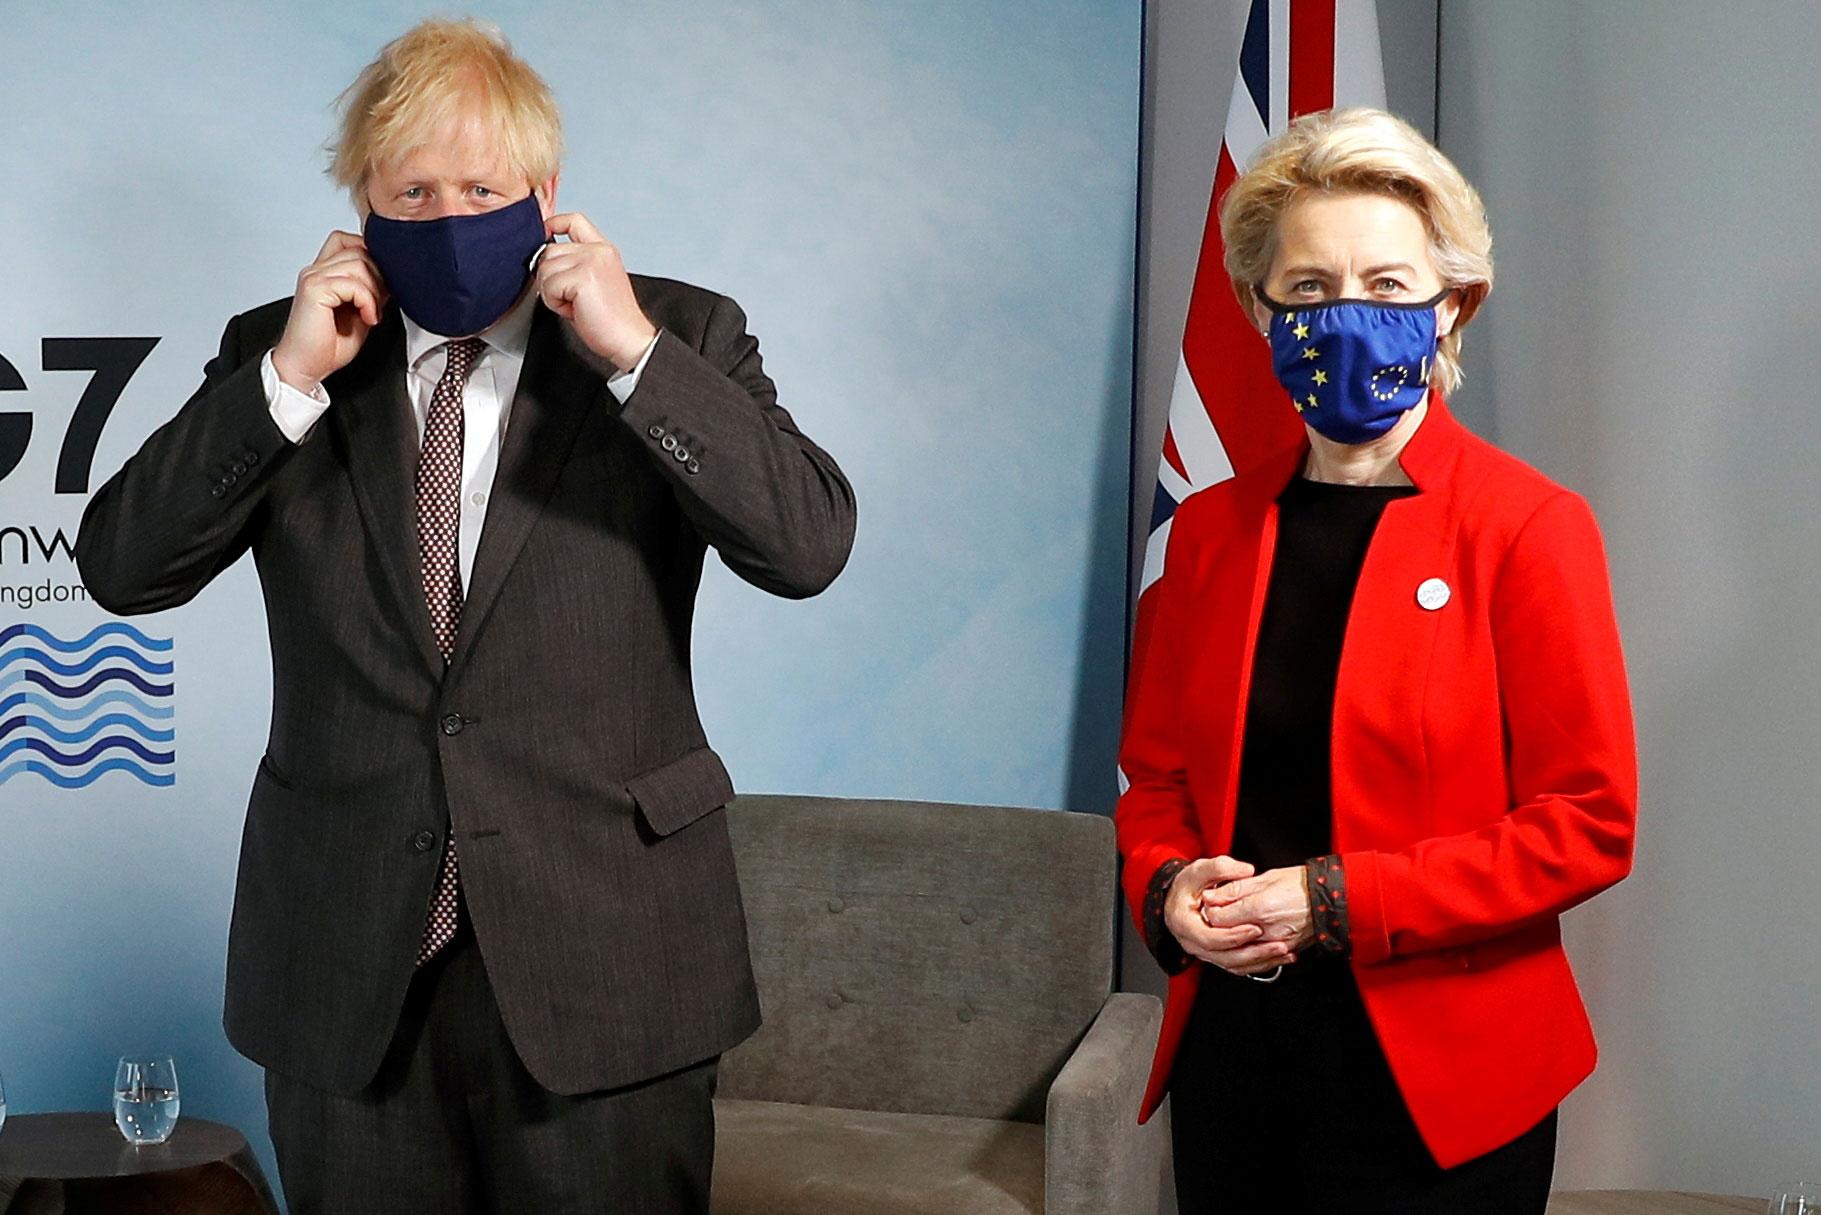 British Prime Minister Boris Johnson meets with European Commission President Ursula von der Leyen during the G7 summit in Carbis Bay, England, on June 12.